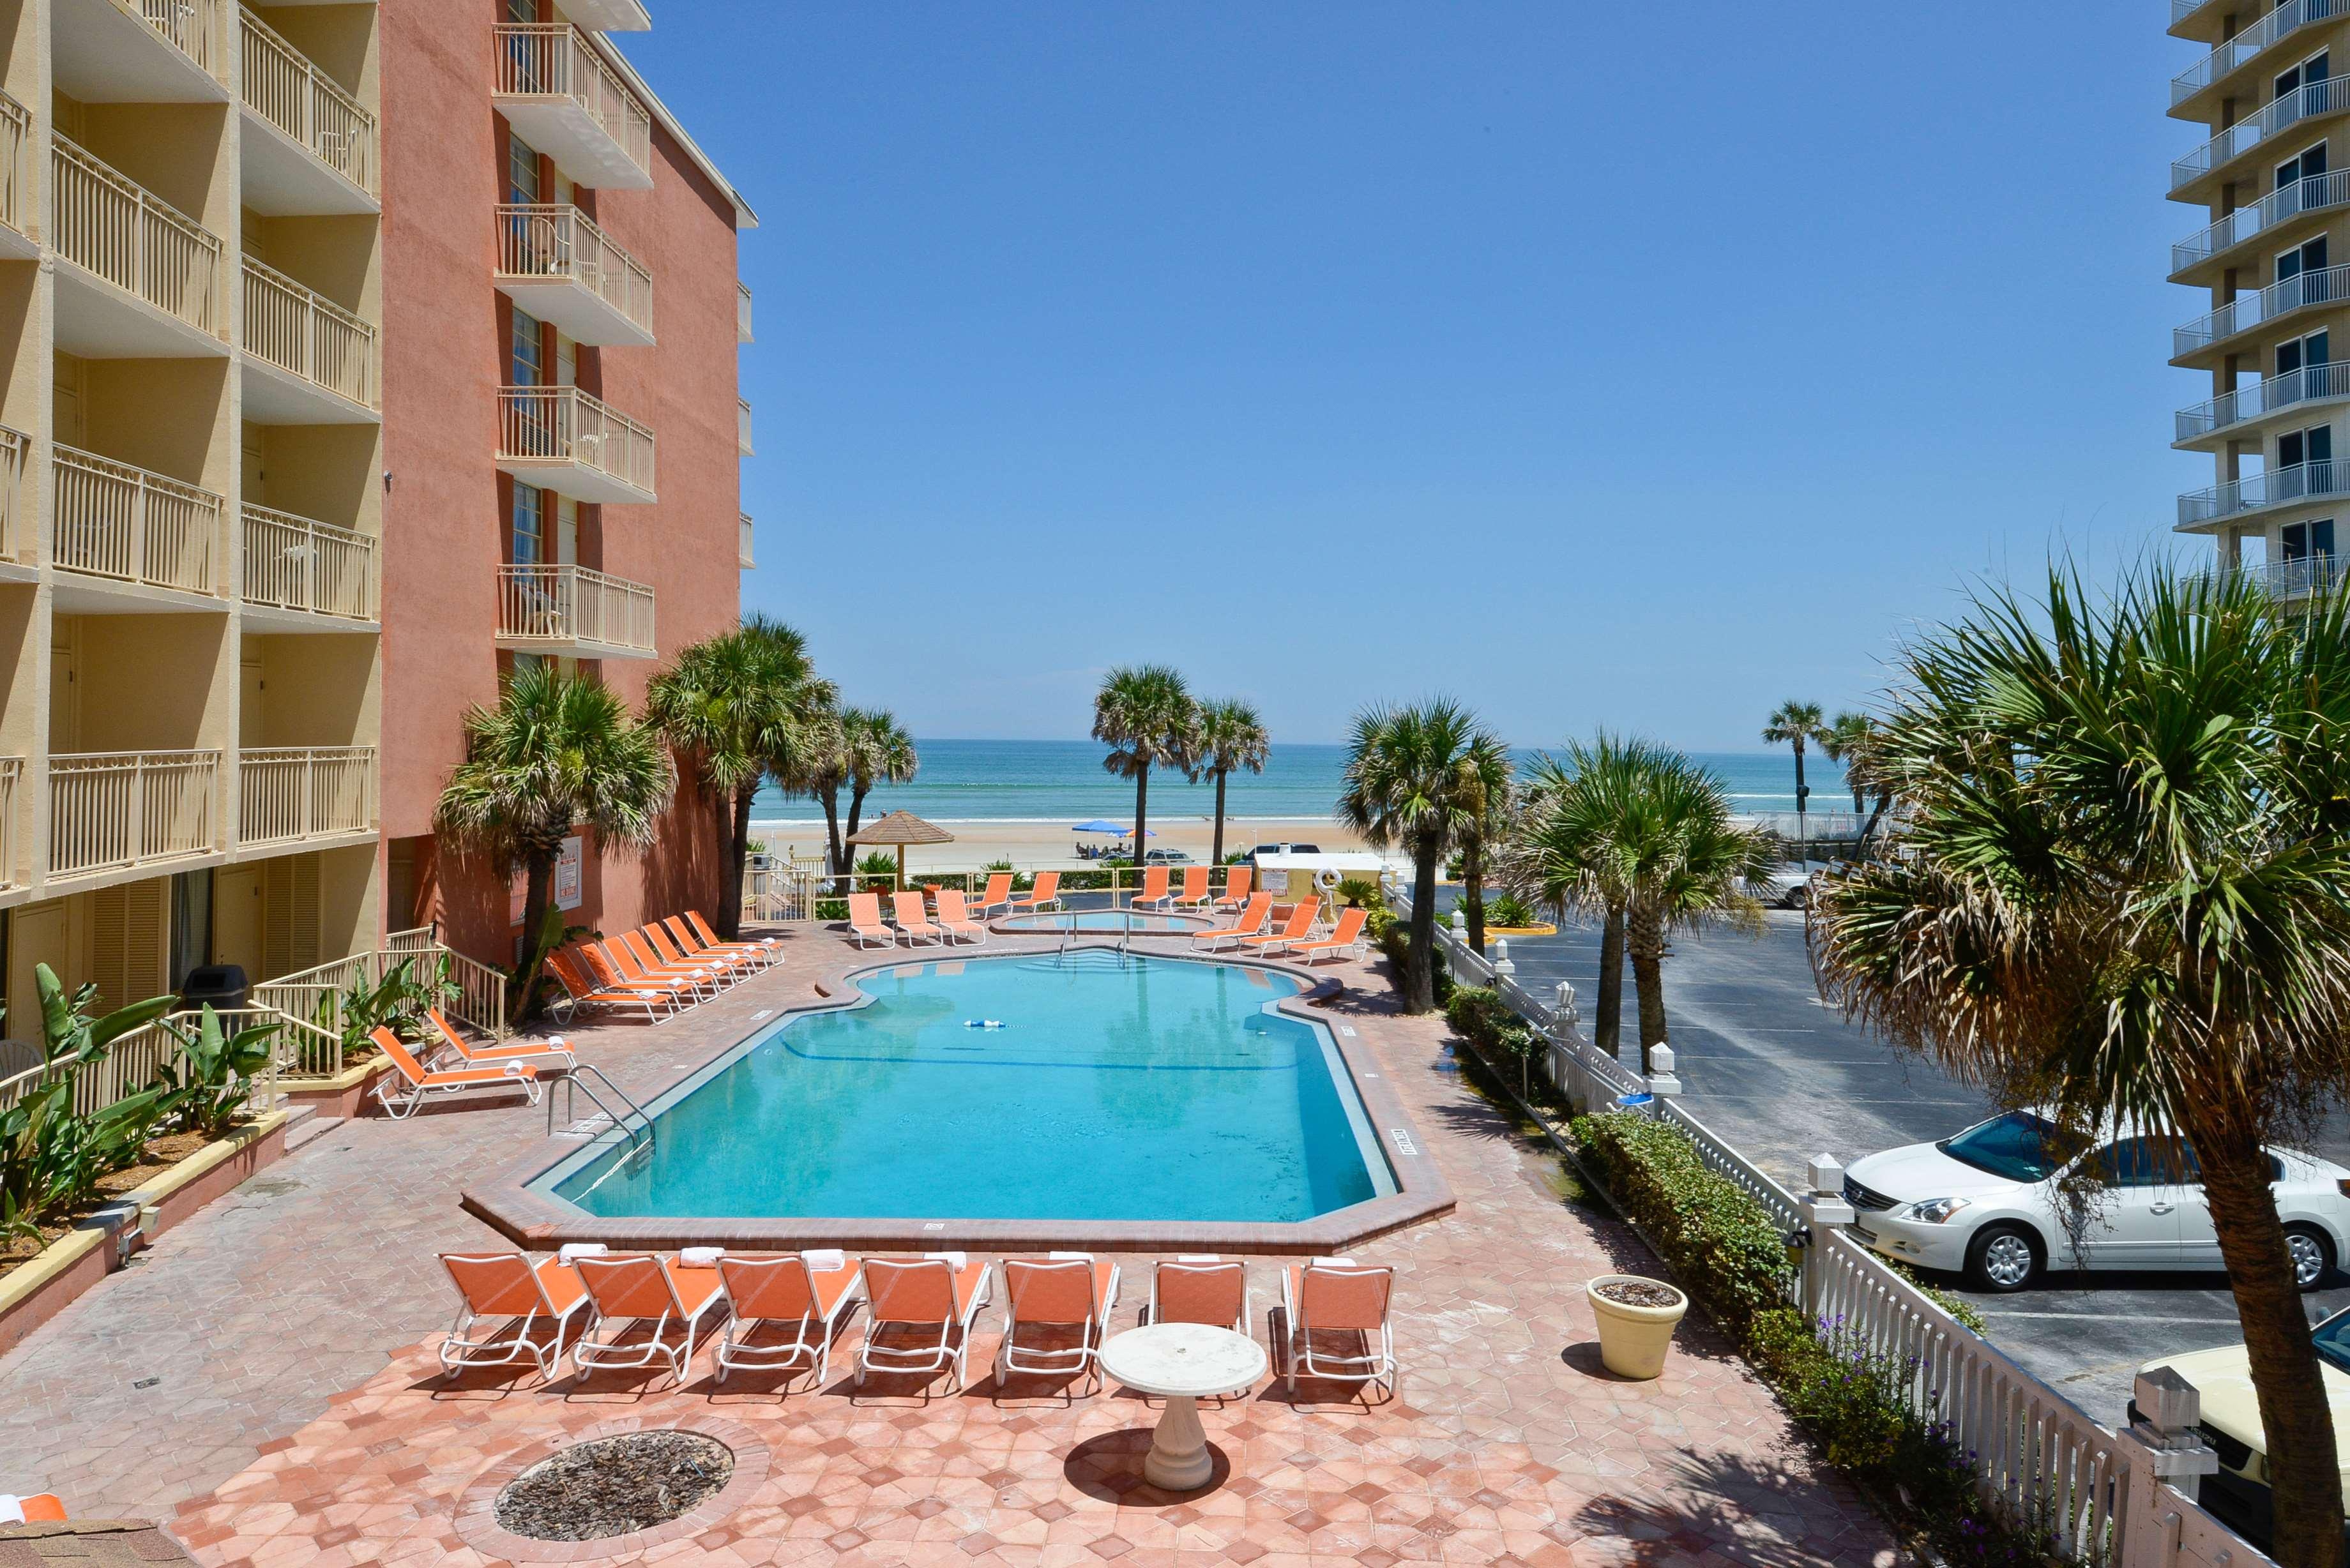 Hotels With Kitchens In Daytona Beach Fl